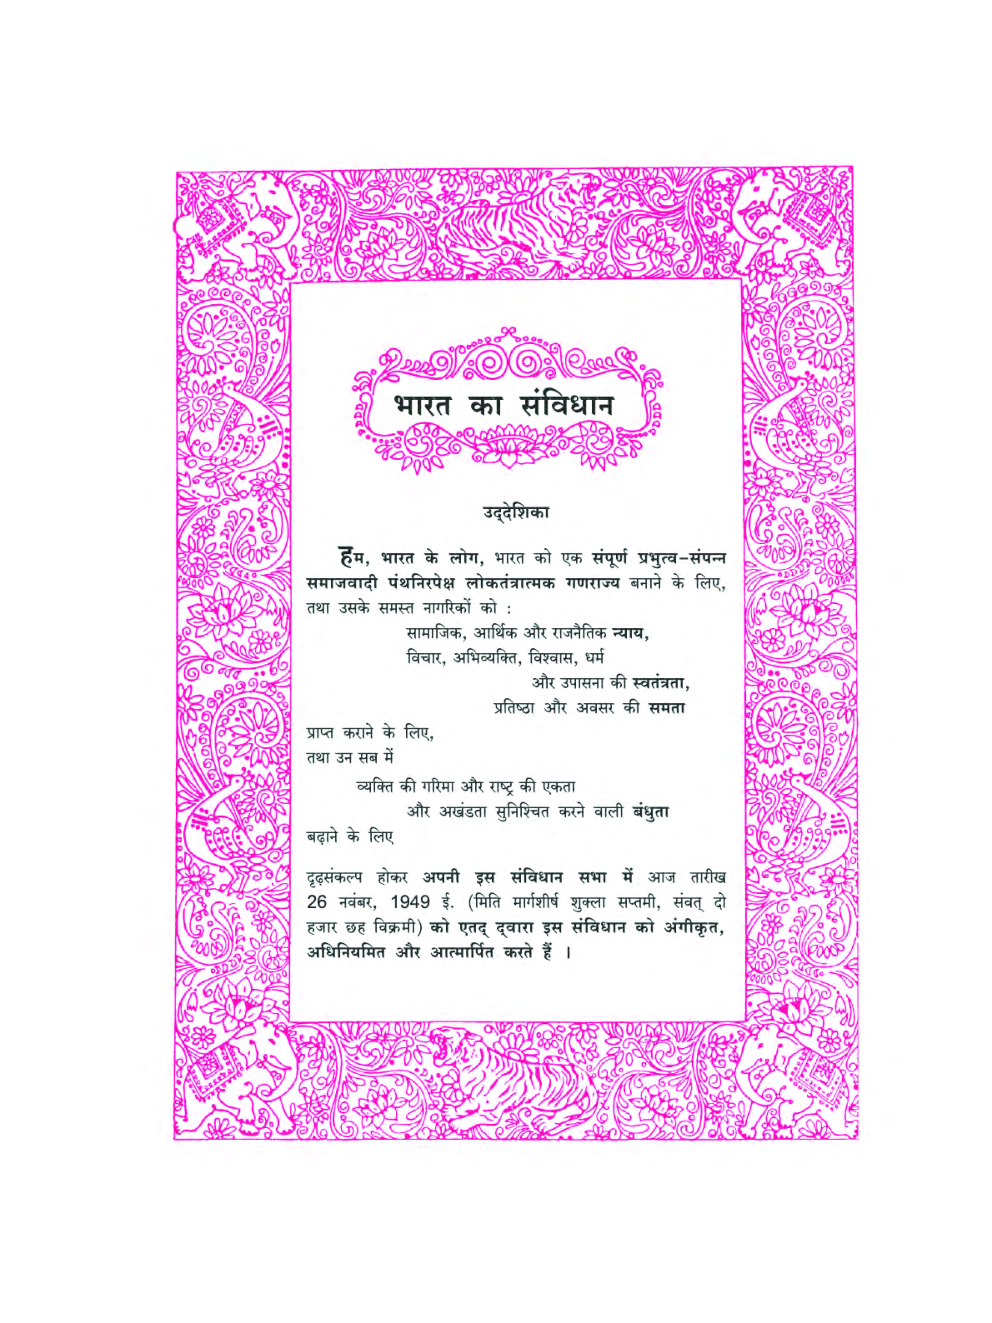 Maharashtra School Textbook परिसर अध्ययन (भाग-१) For Class-5 - Page 4